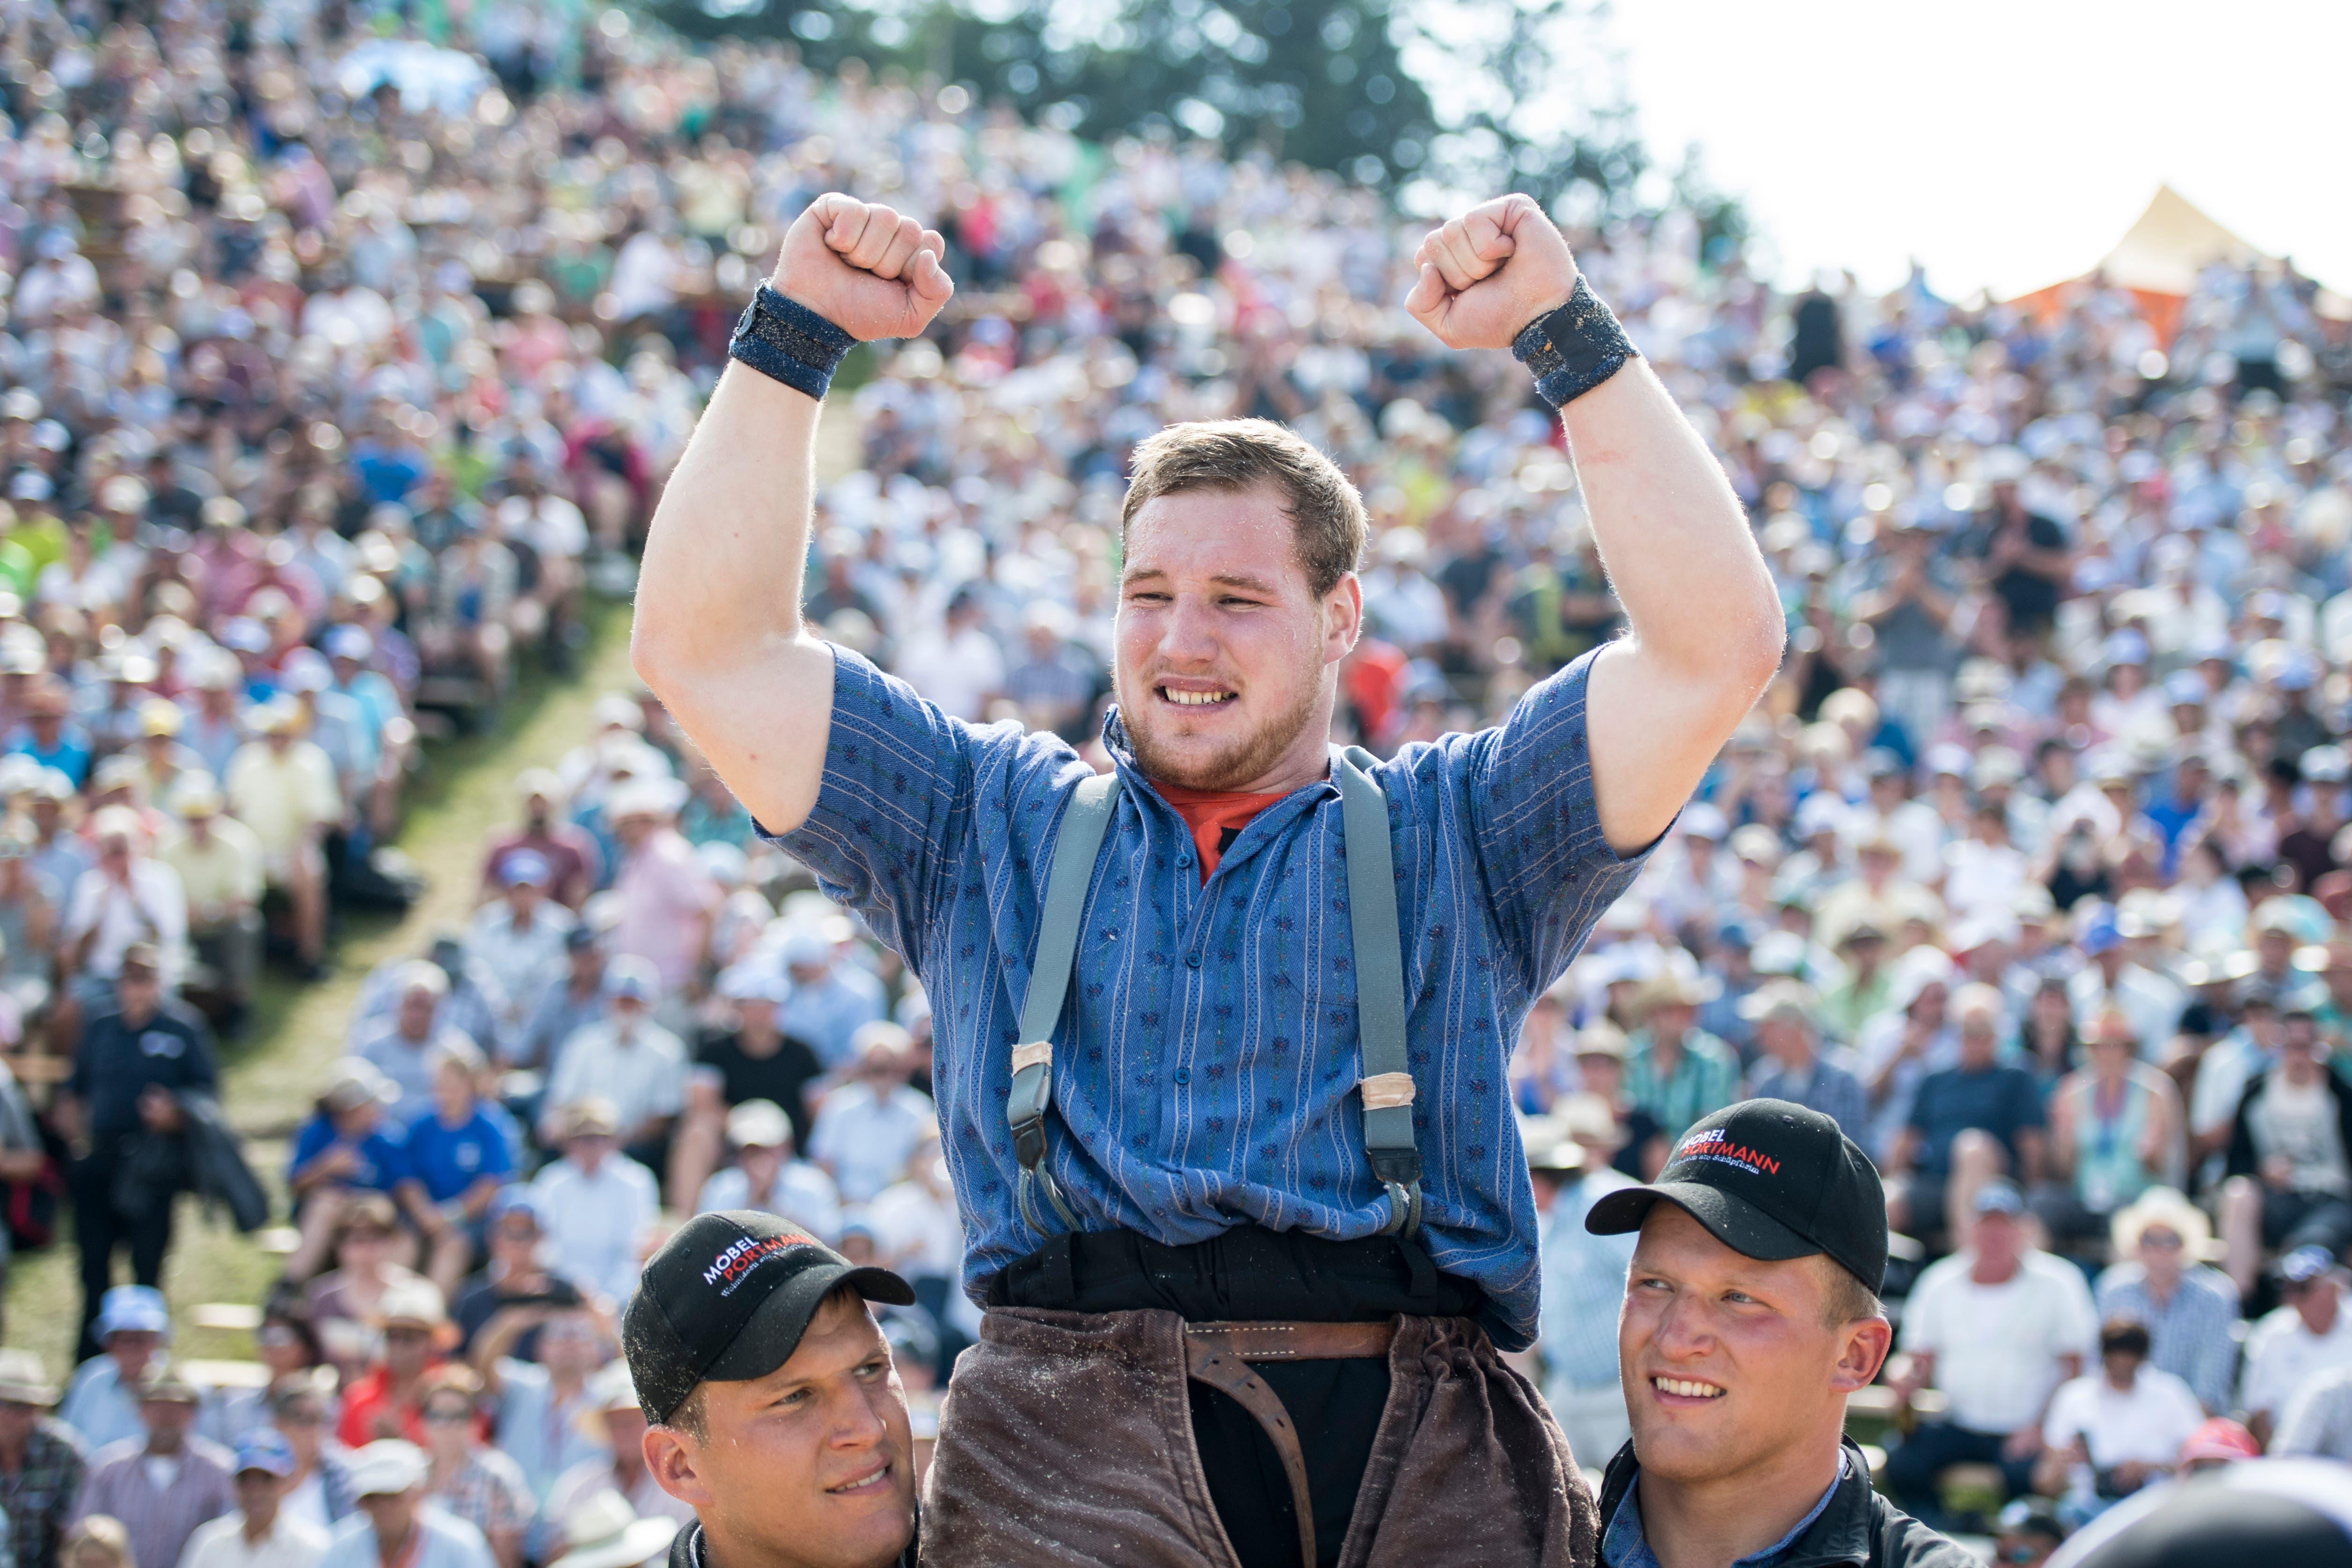 Joel Wicki feiert seinen Sieg gegen Armon Orlik. (Bild: Urs Flüeler/Keystone (Rigi, 8. Juli 2008))